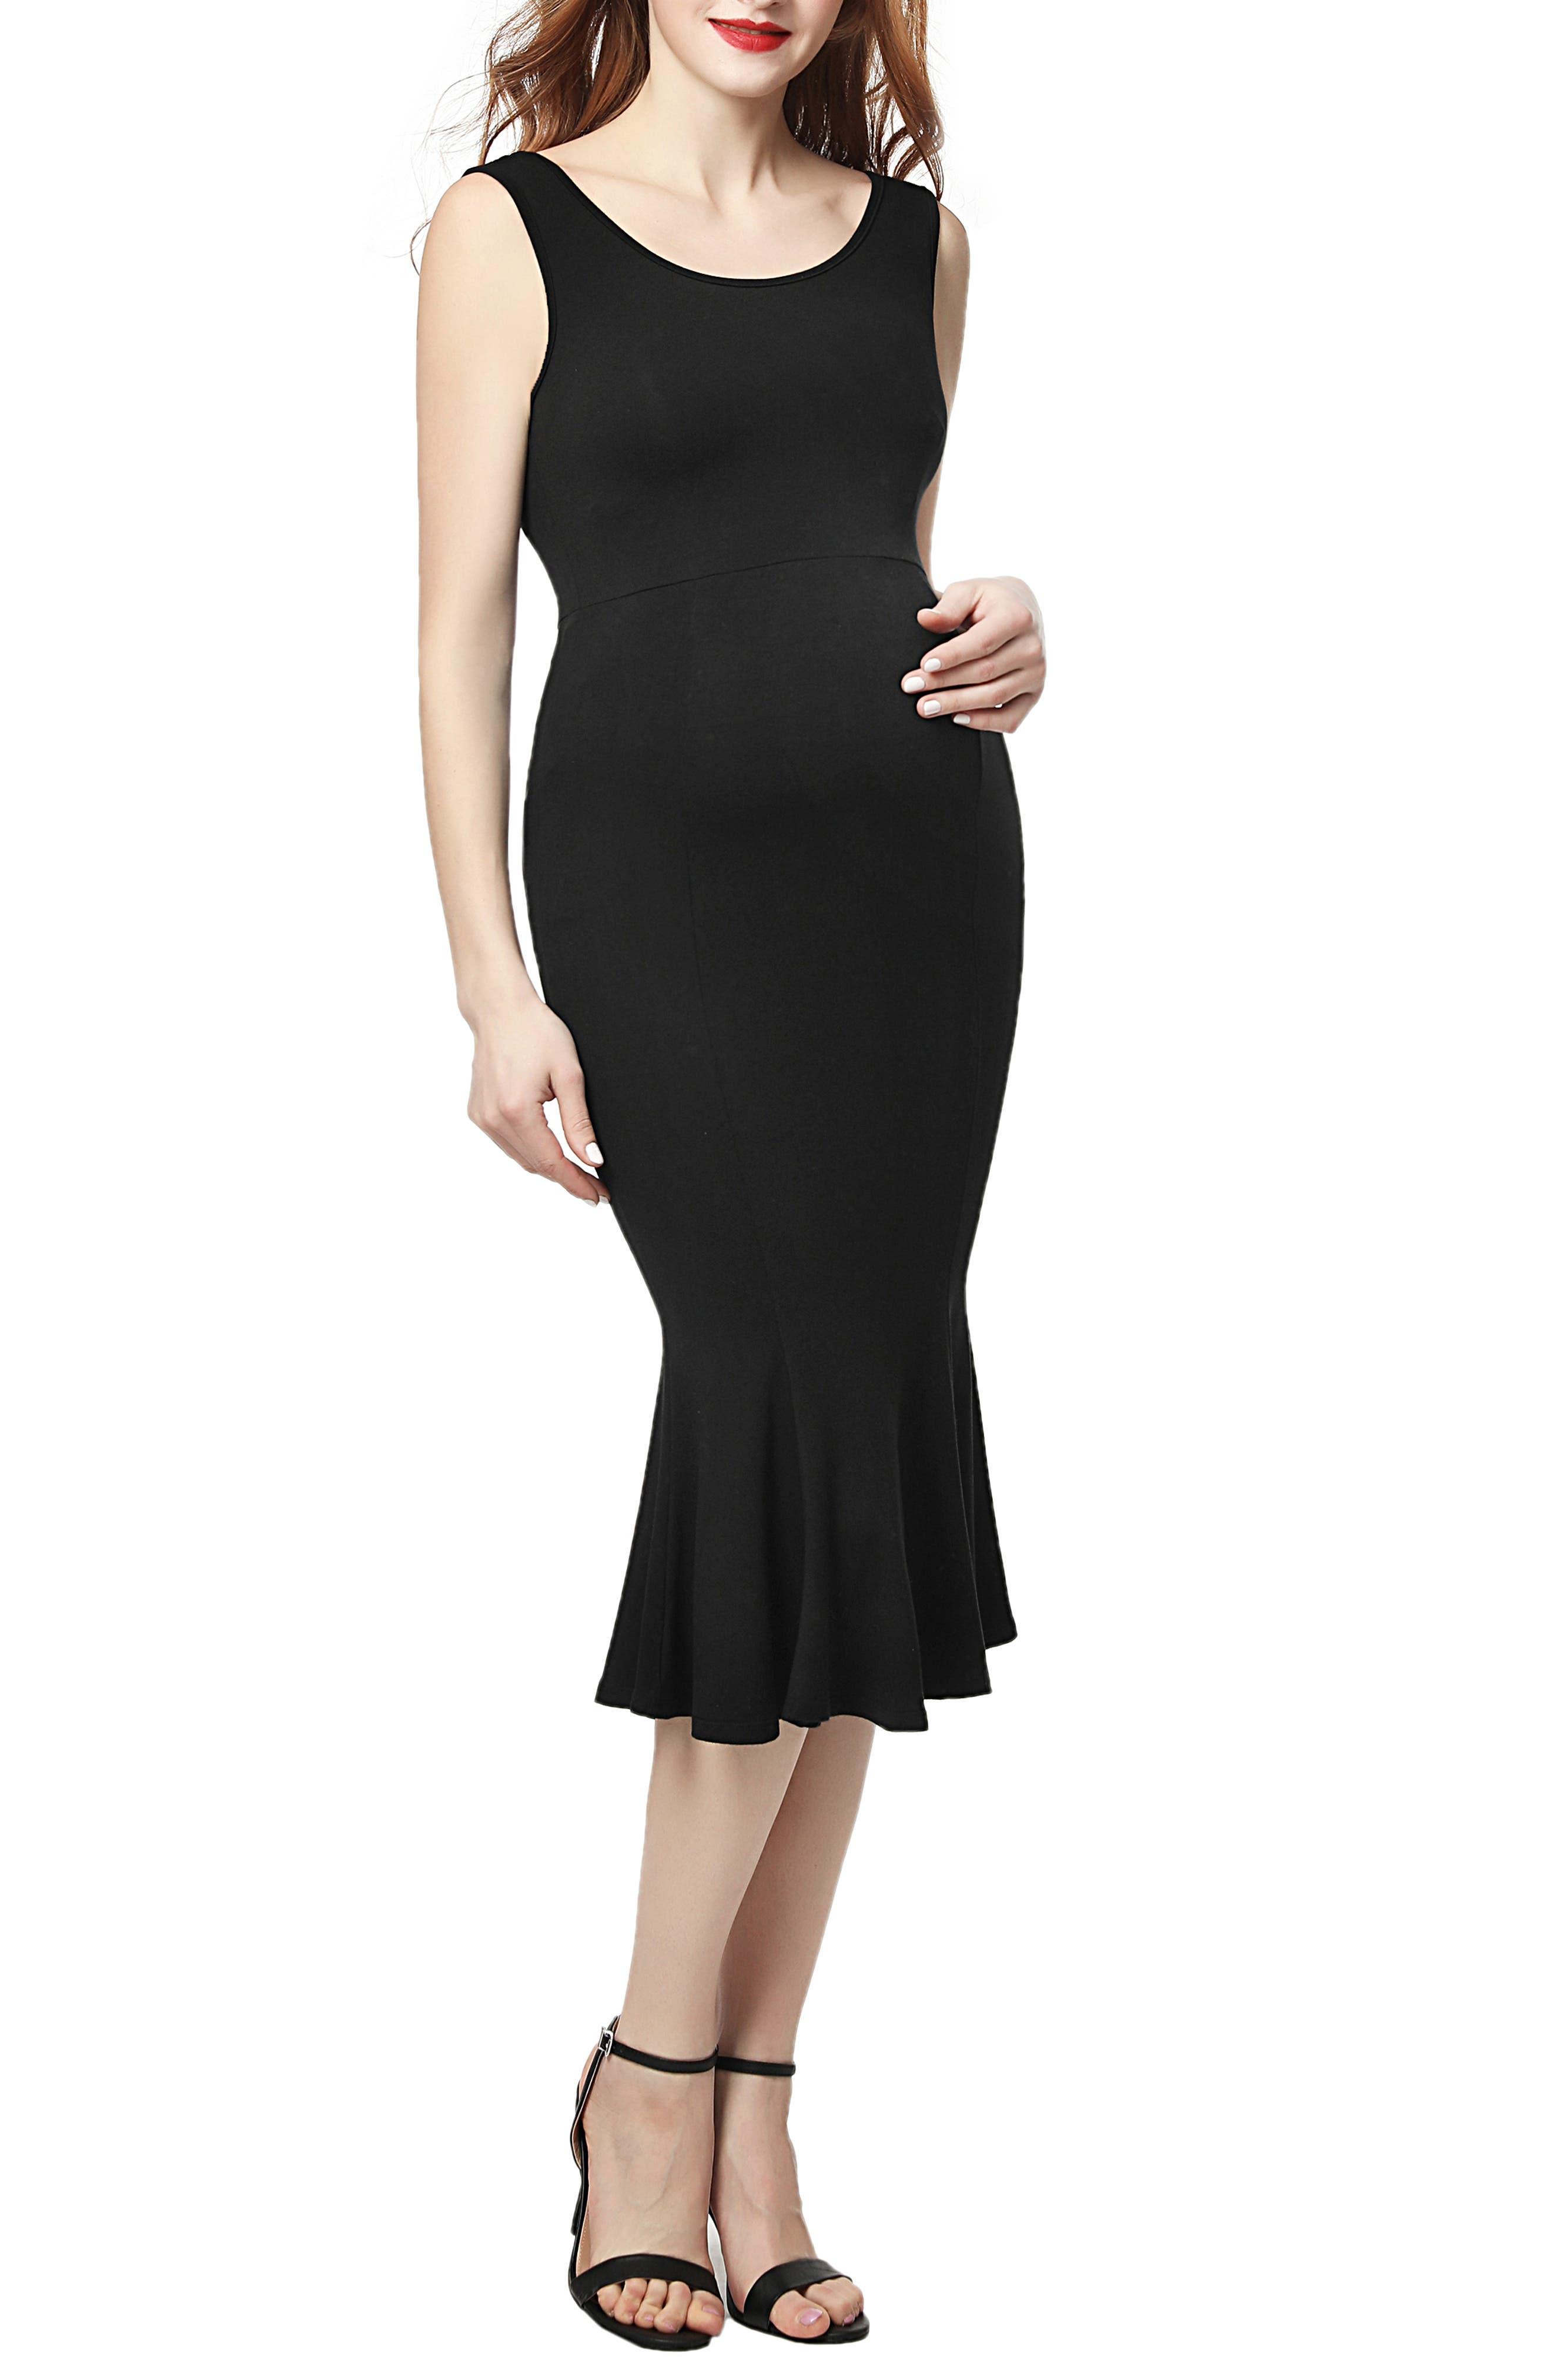 Kimi And Kai Bria Maternity Mermaid Midi Dress, Black